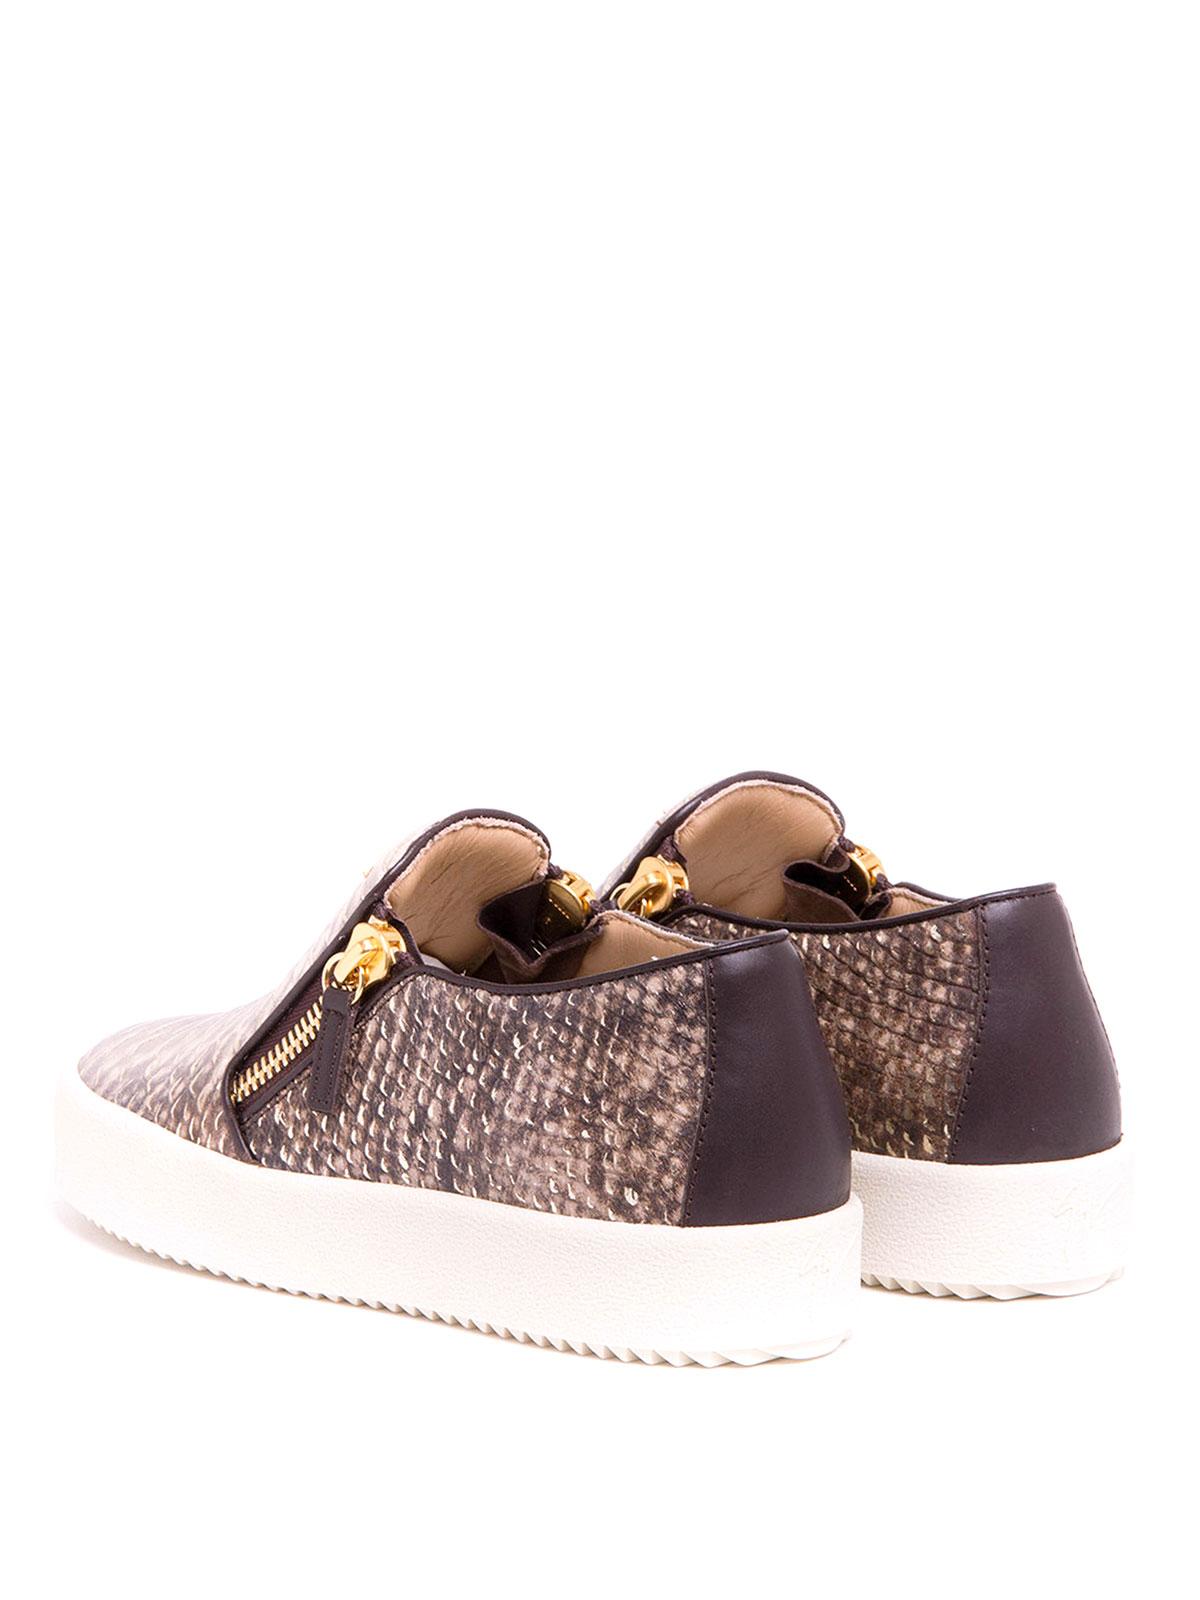 475c66bbd2125 Giuseppe Zanotti Silver Shoes Wedding Dbz Cell Shoes | Law Lanka